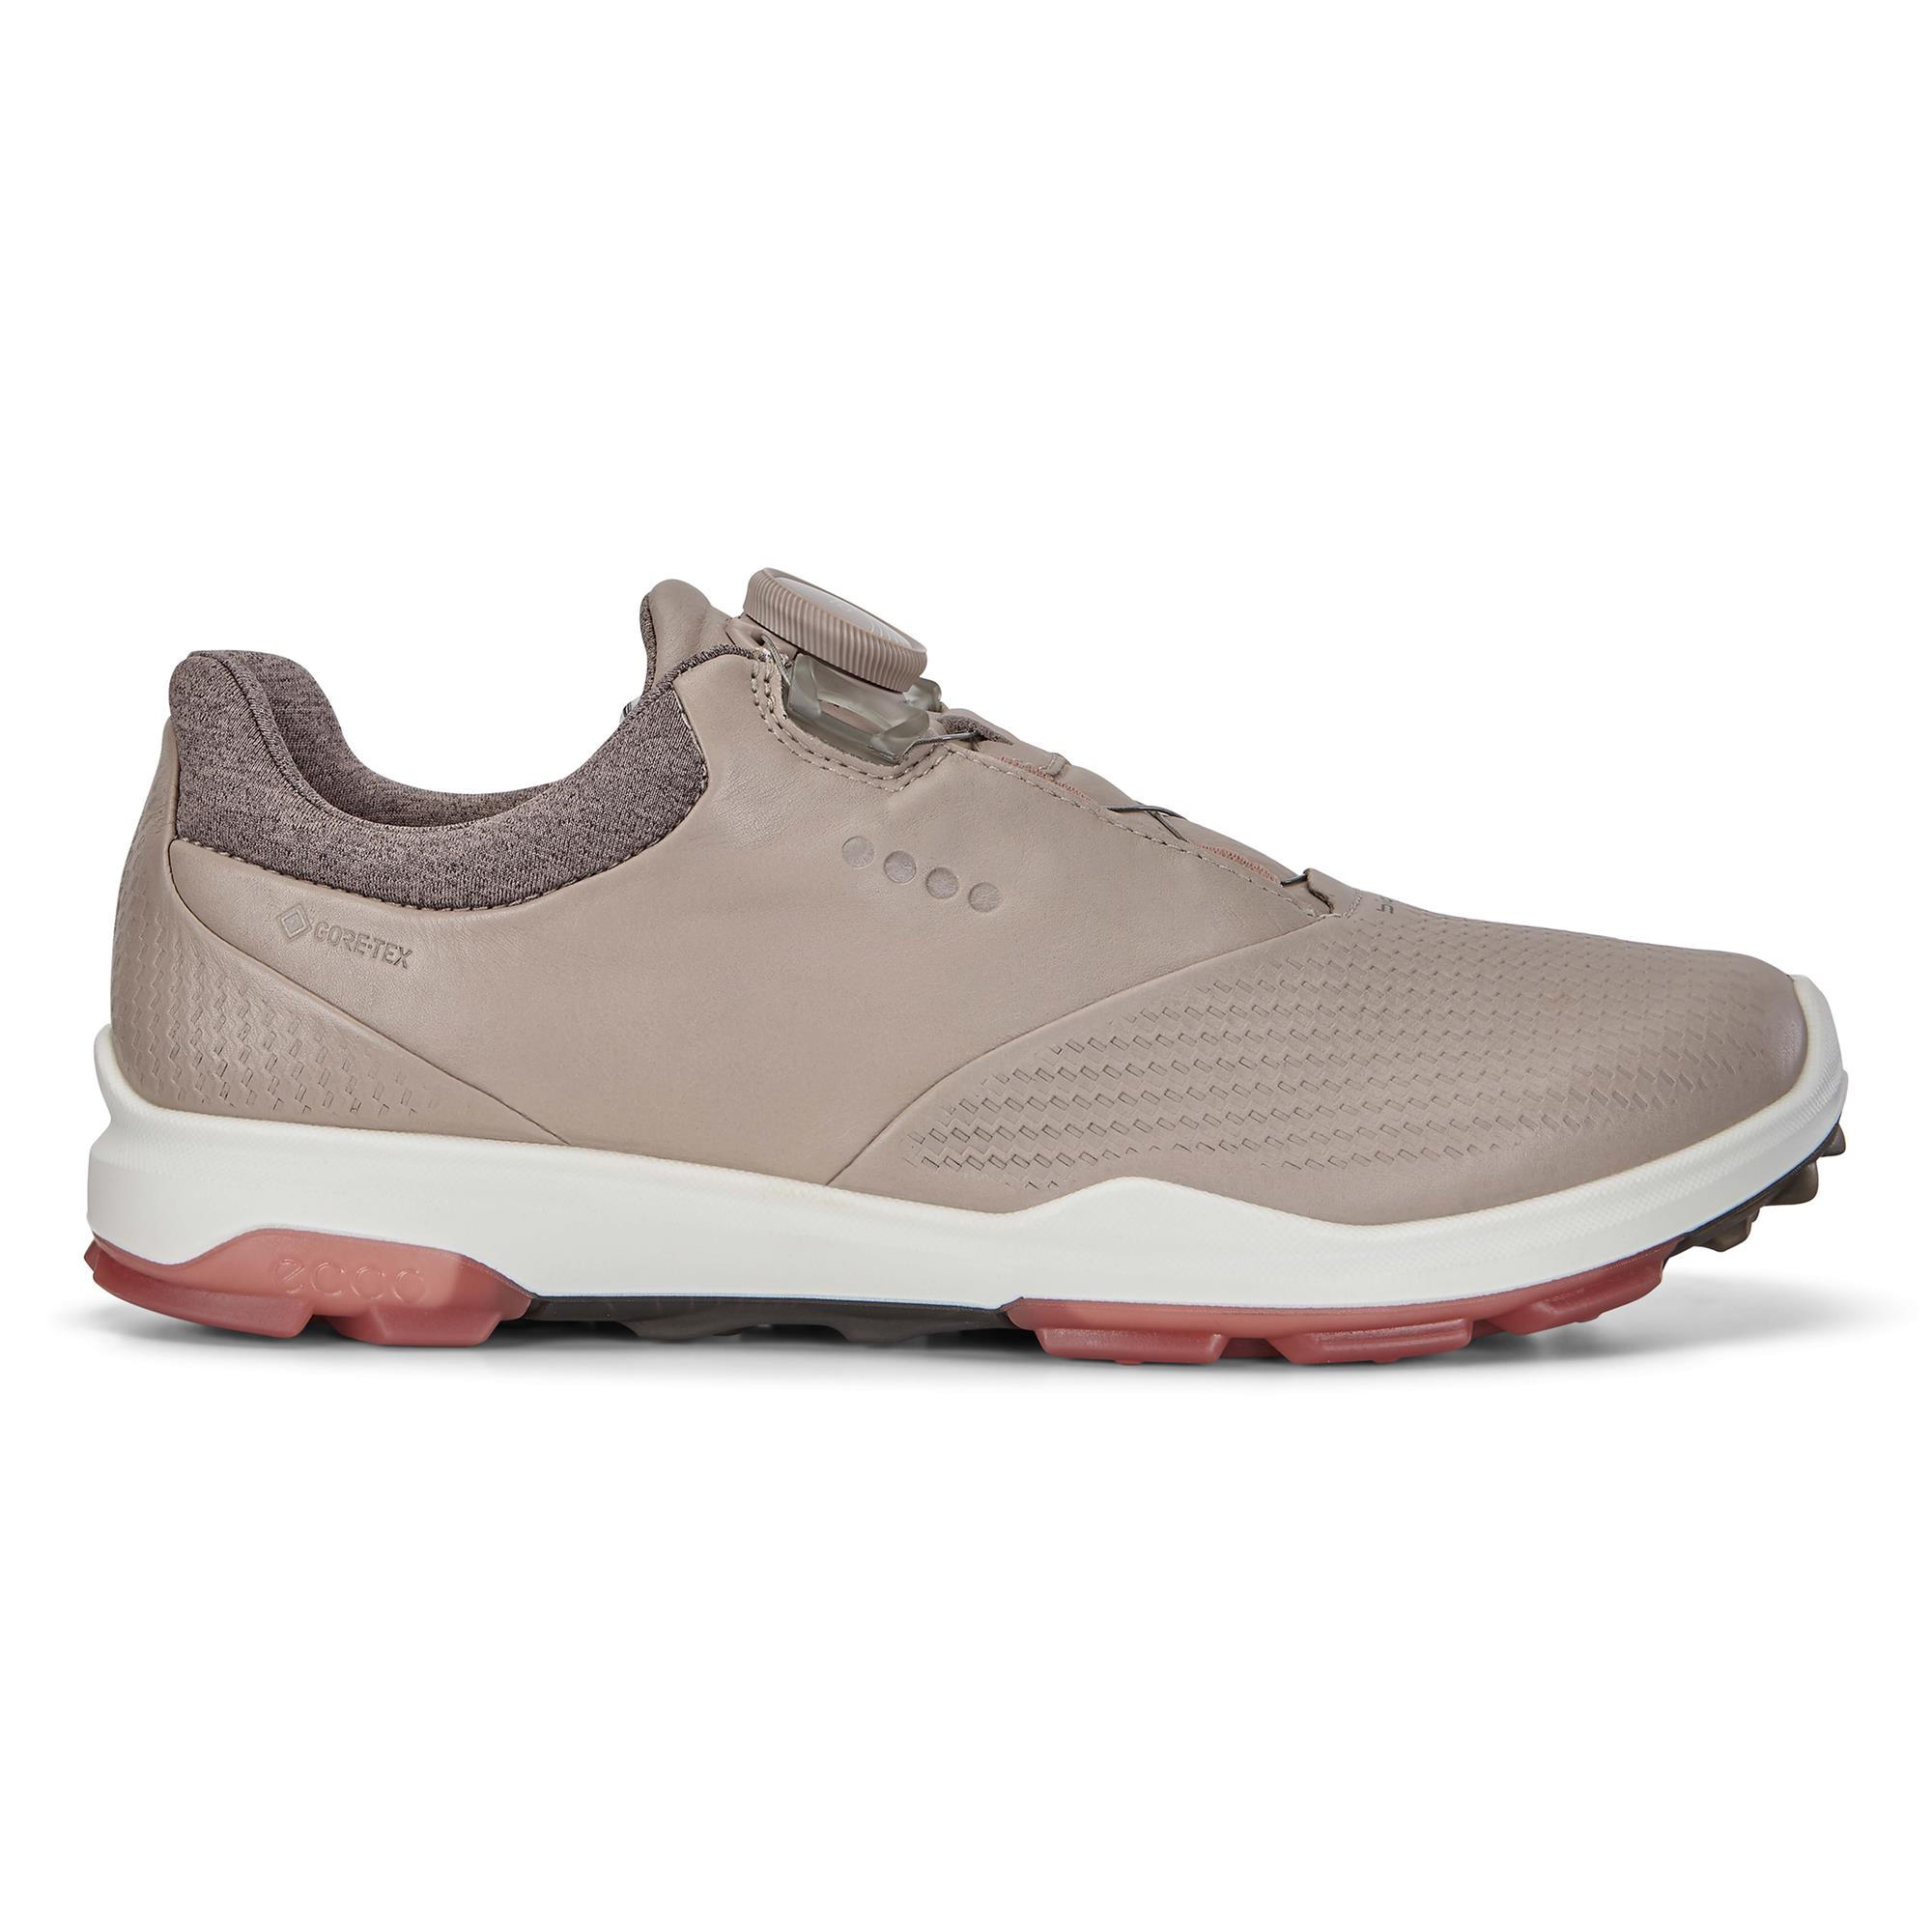 discount ecco ladies golf shoes